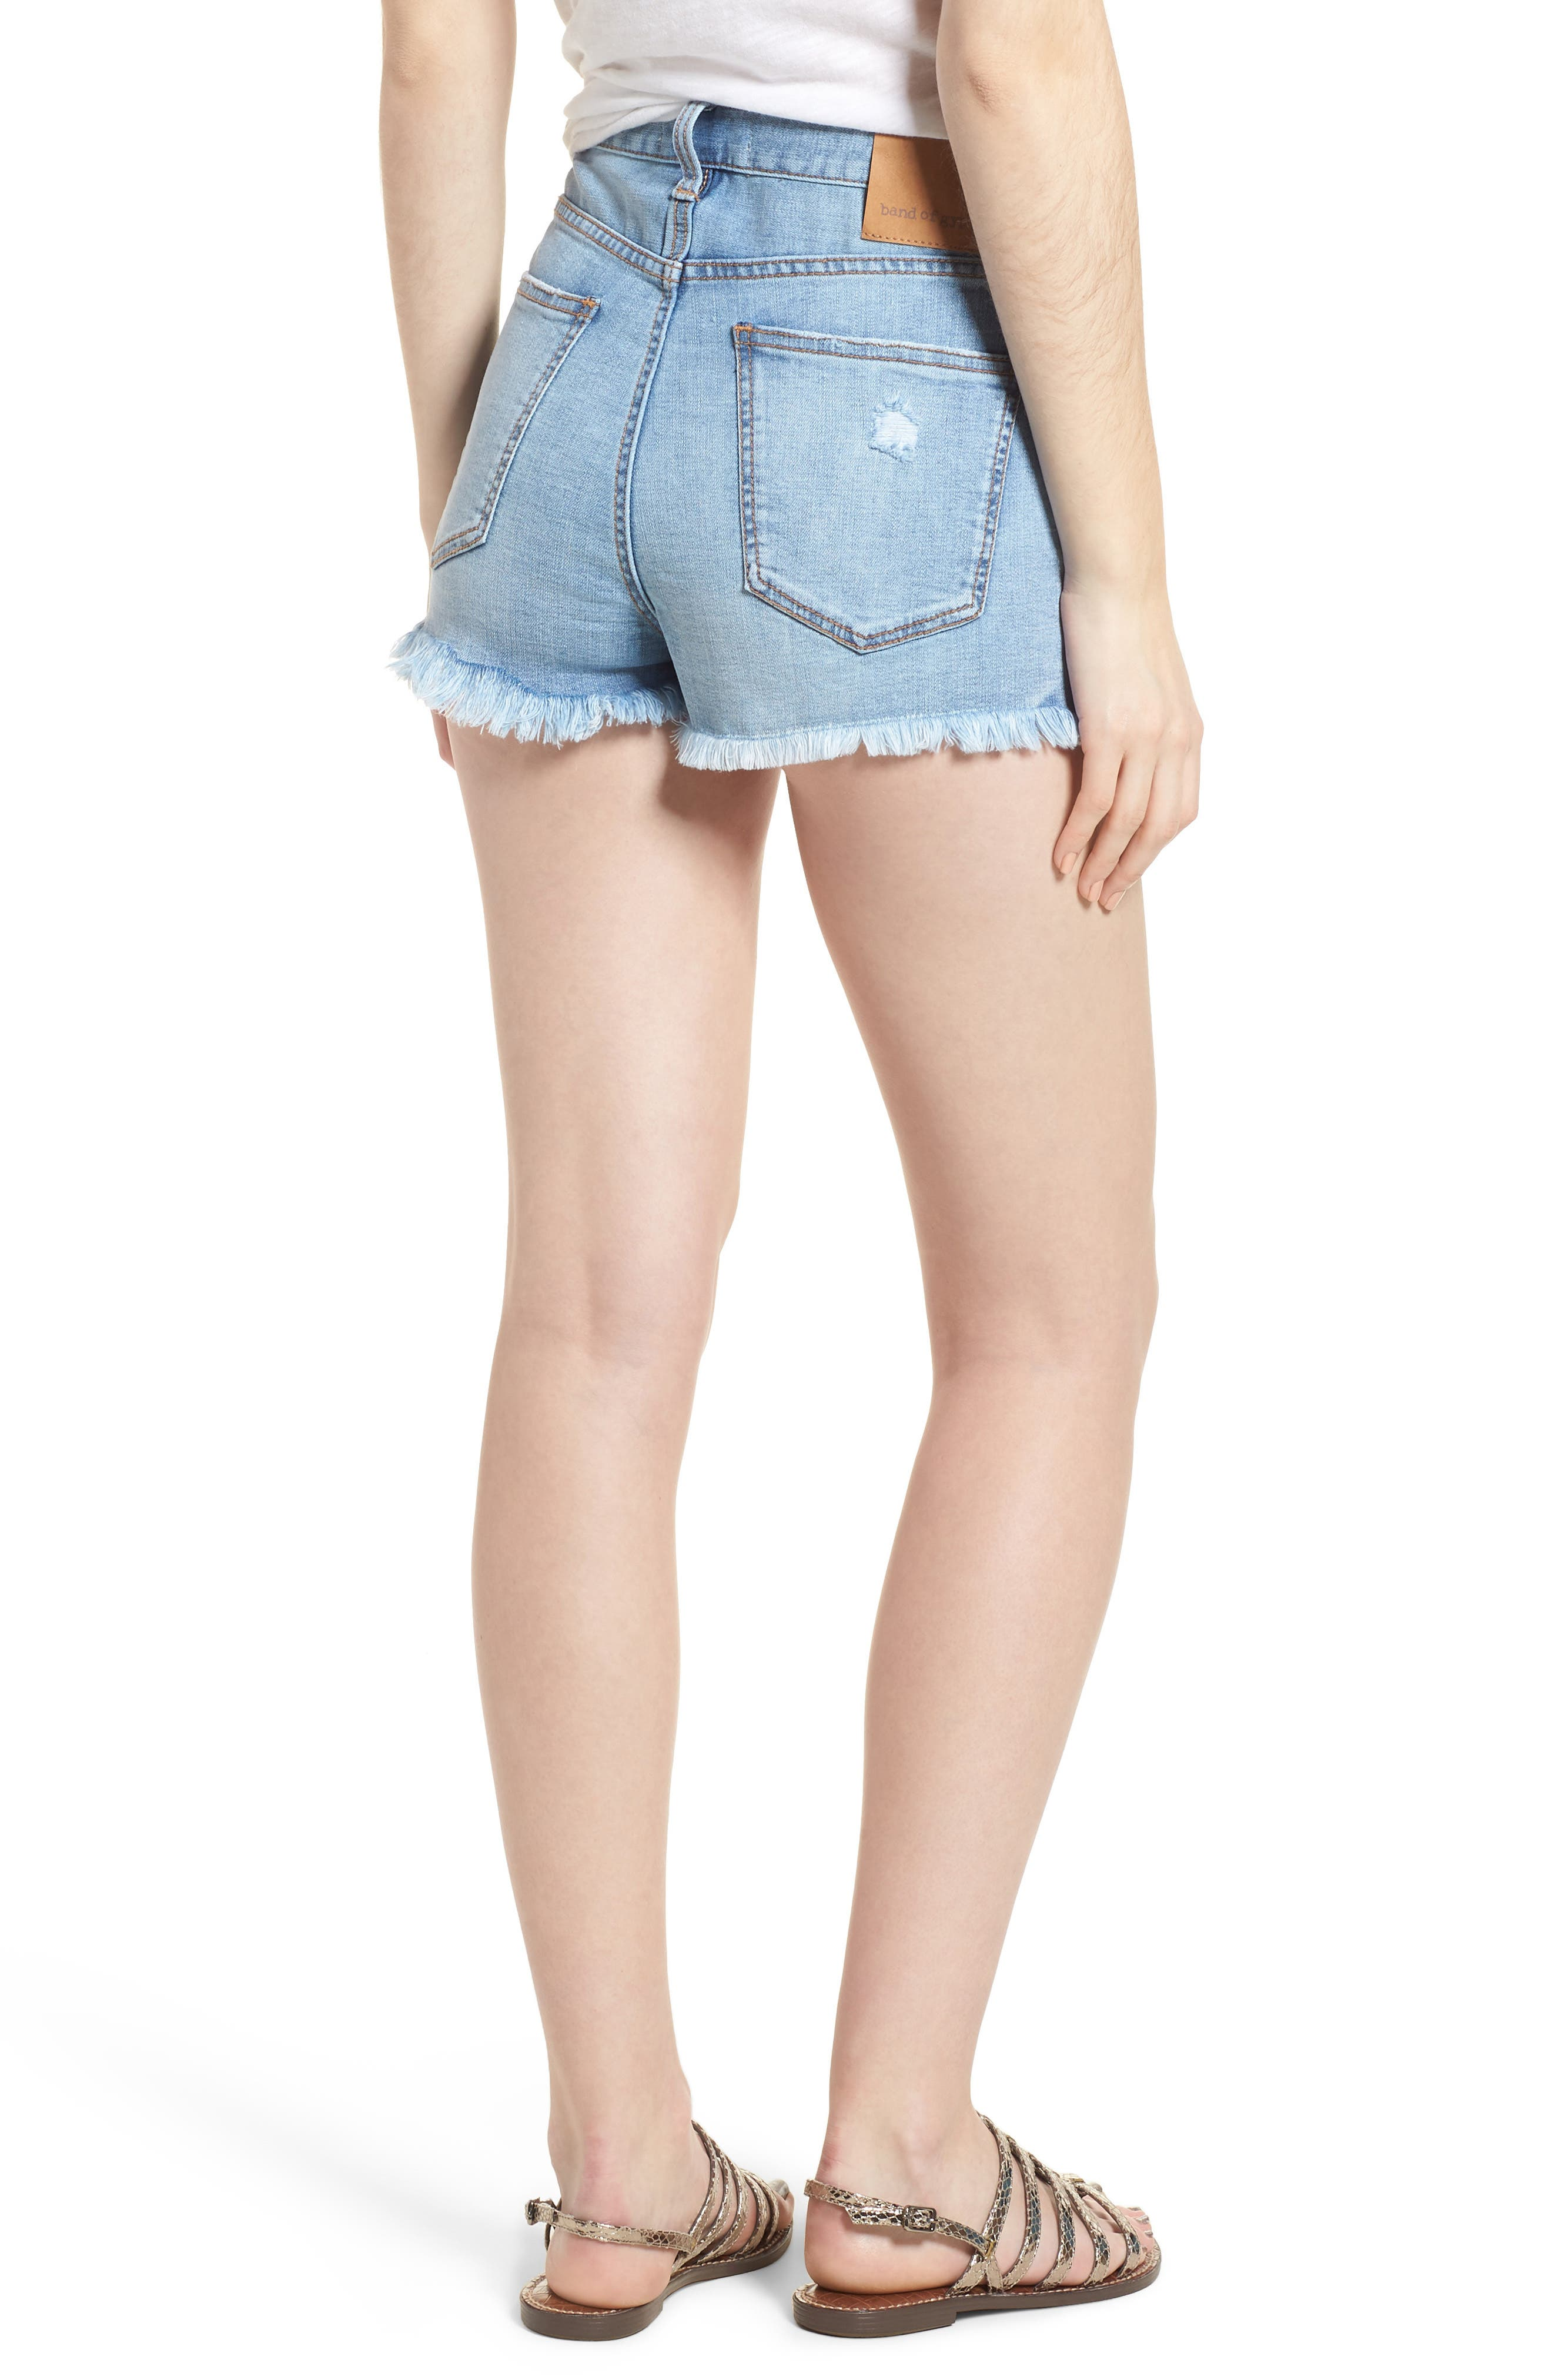 Zoey Denim Shorts,                             Alternate thumbnail 2, color,                             402